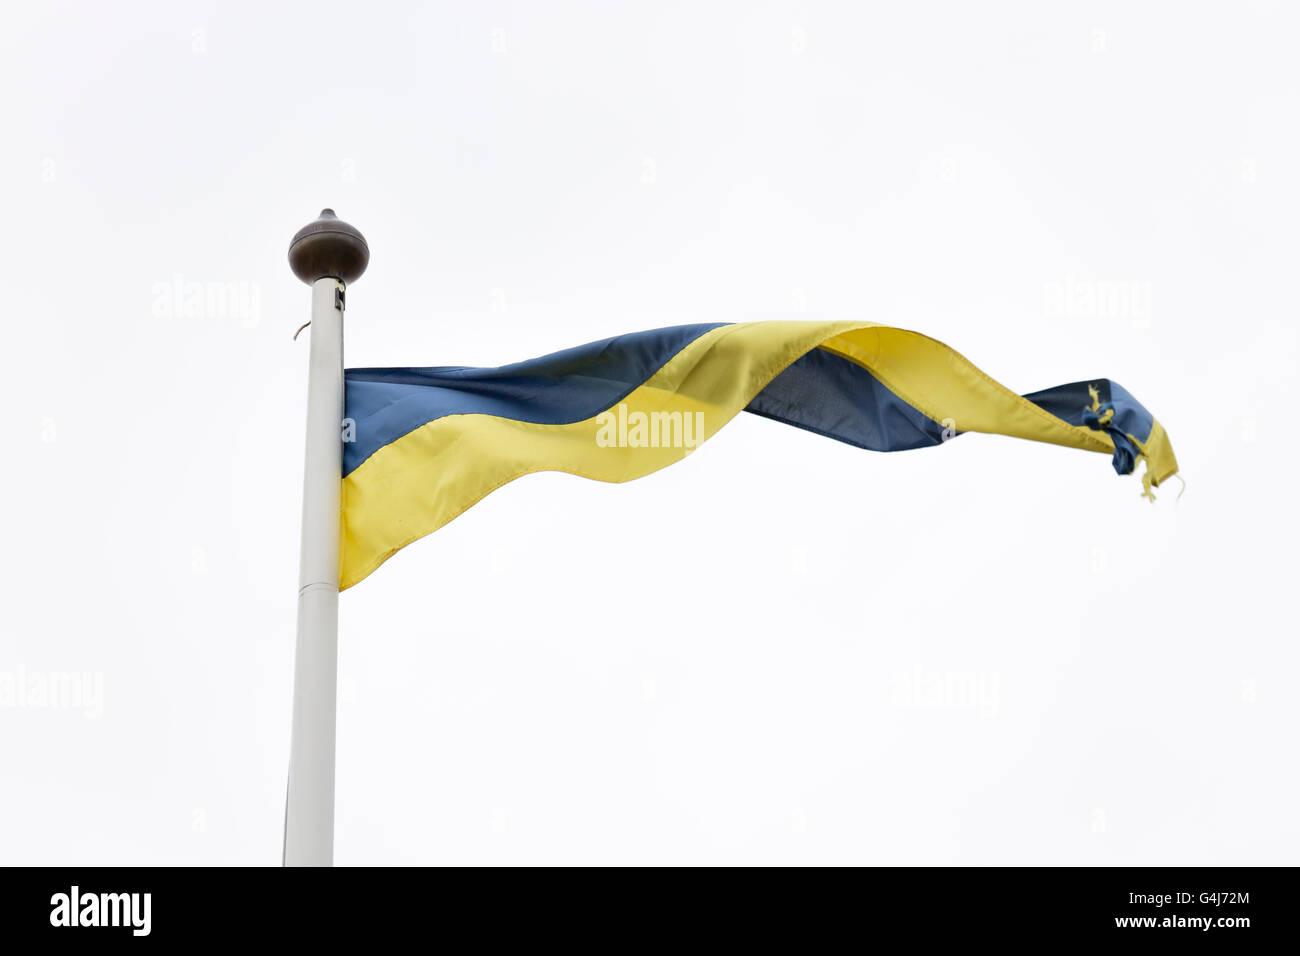 Swedish Yellow and Blue Pennant on white/grey background. - Stock Image